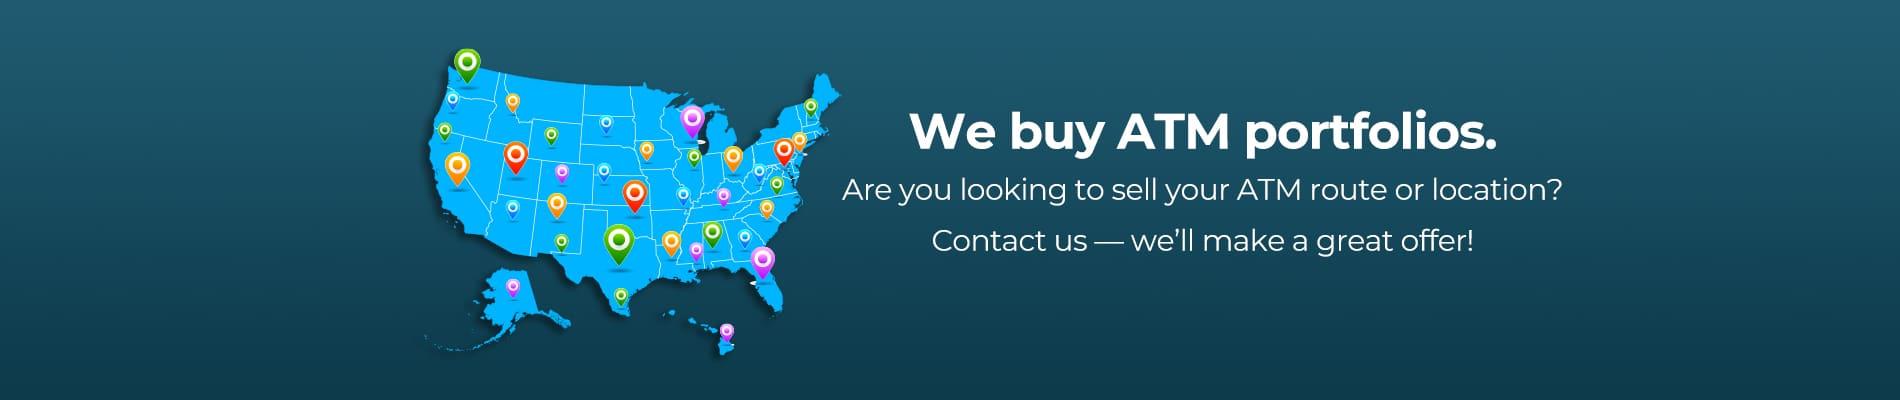 We buy ATM Portfolios